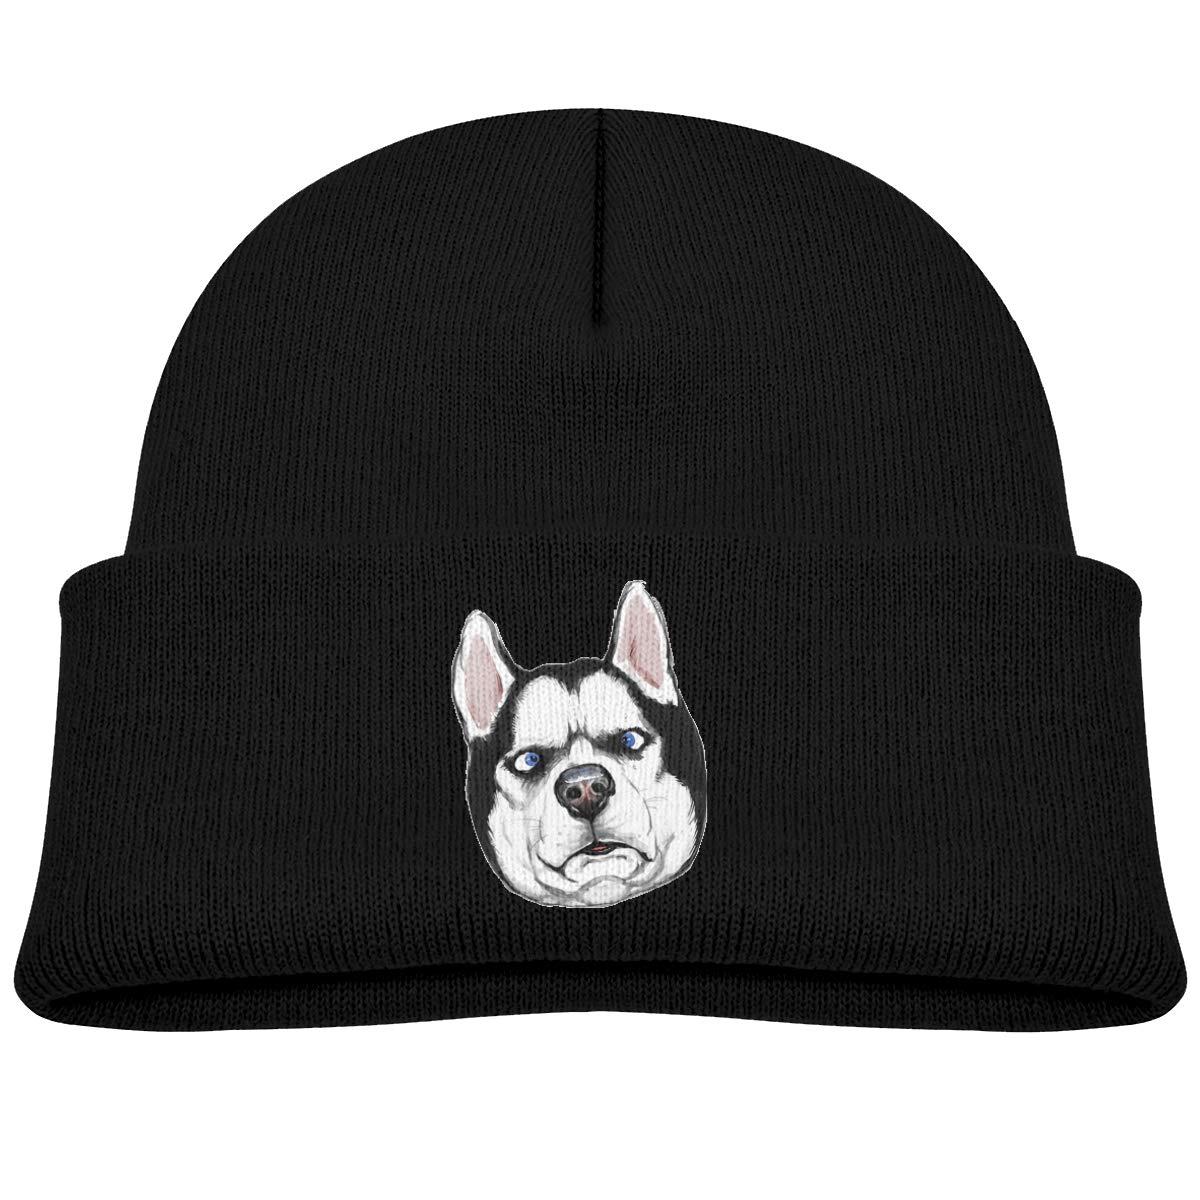 Banana King Siberian Husky Dog Baby Beanie Hat Toddler Winter Warm Knit Woolen Cap for Boys//Girls